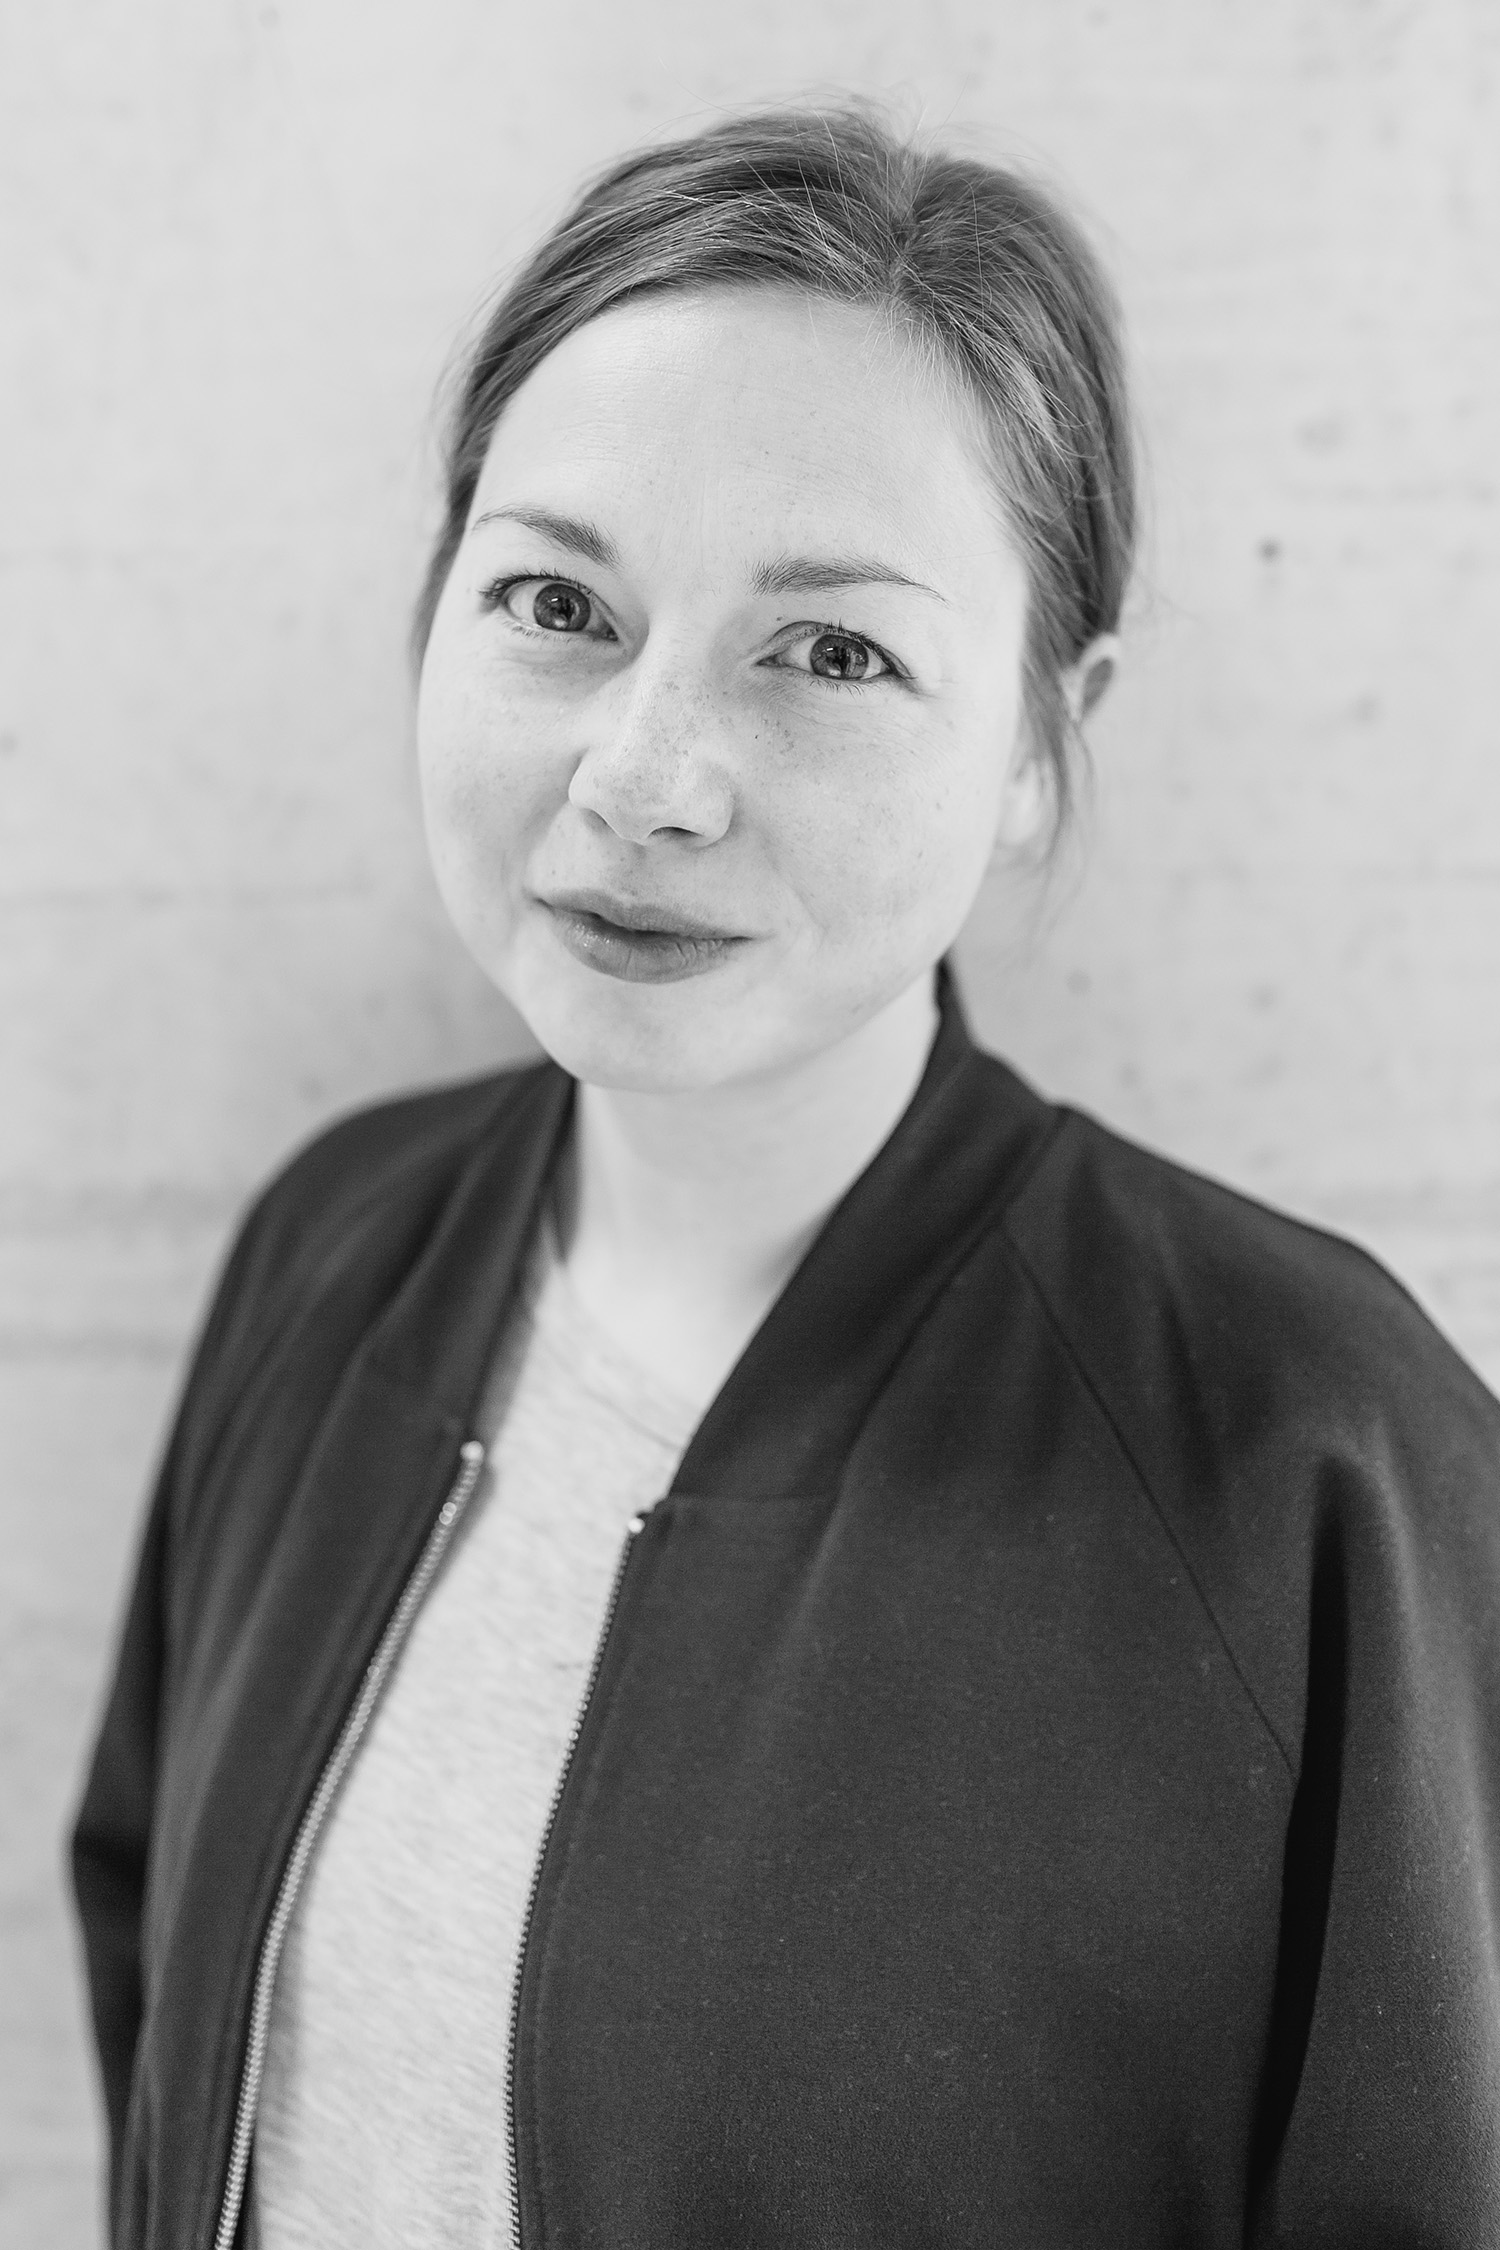 Linda Heiman | arkitekt MSA (Föräldraledig) 031 - 303 44 06  linda@qpg.se